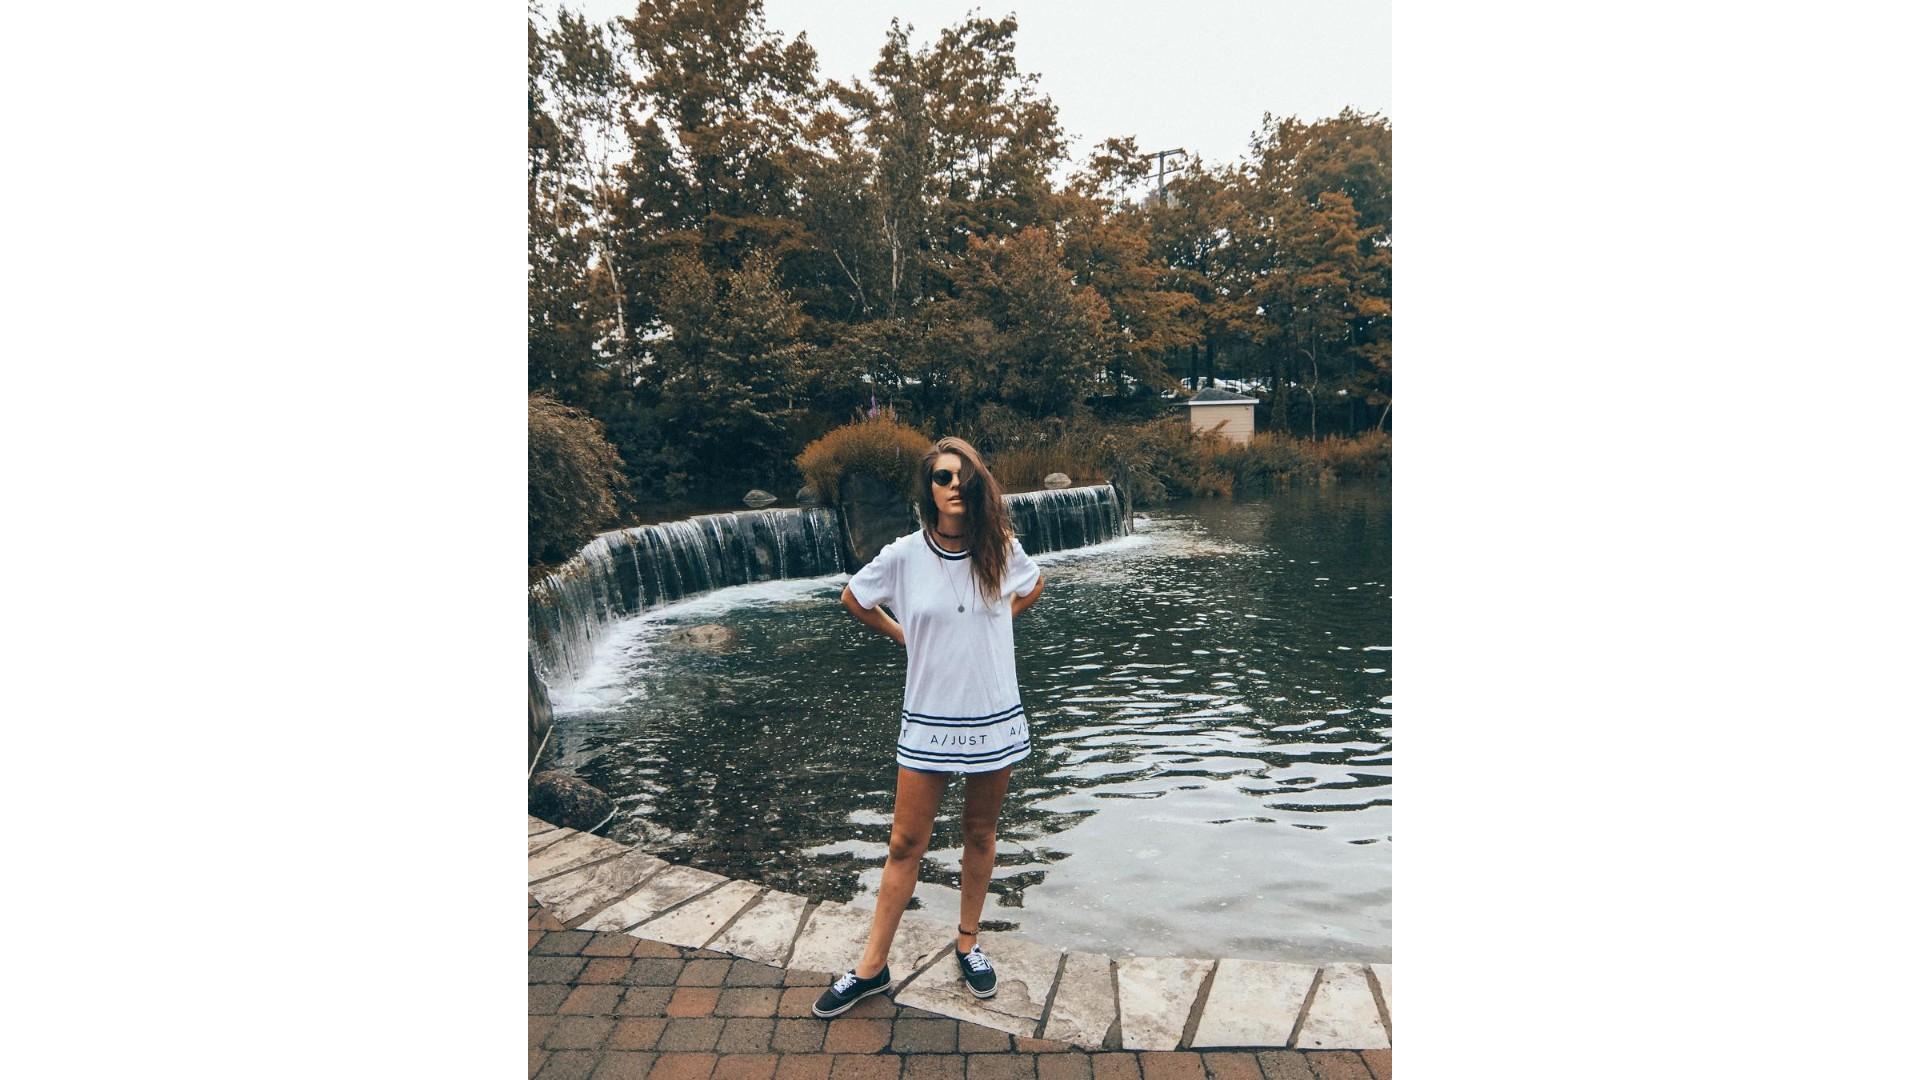 OD Grèce: 18 photos de Jessika, l'ex-chanteuse pop aventurière